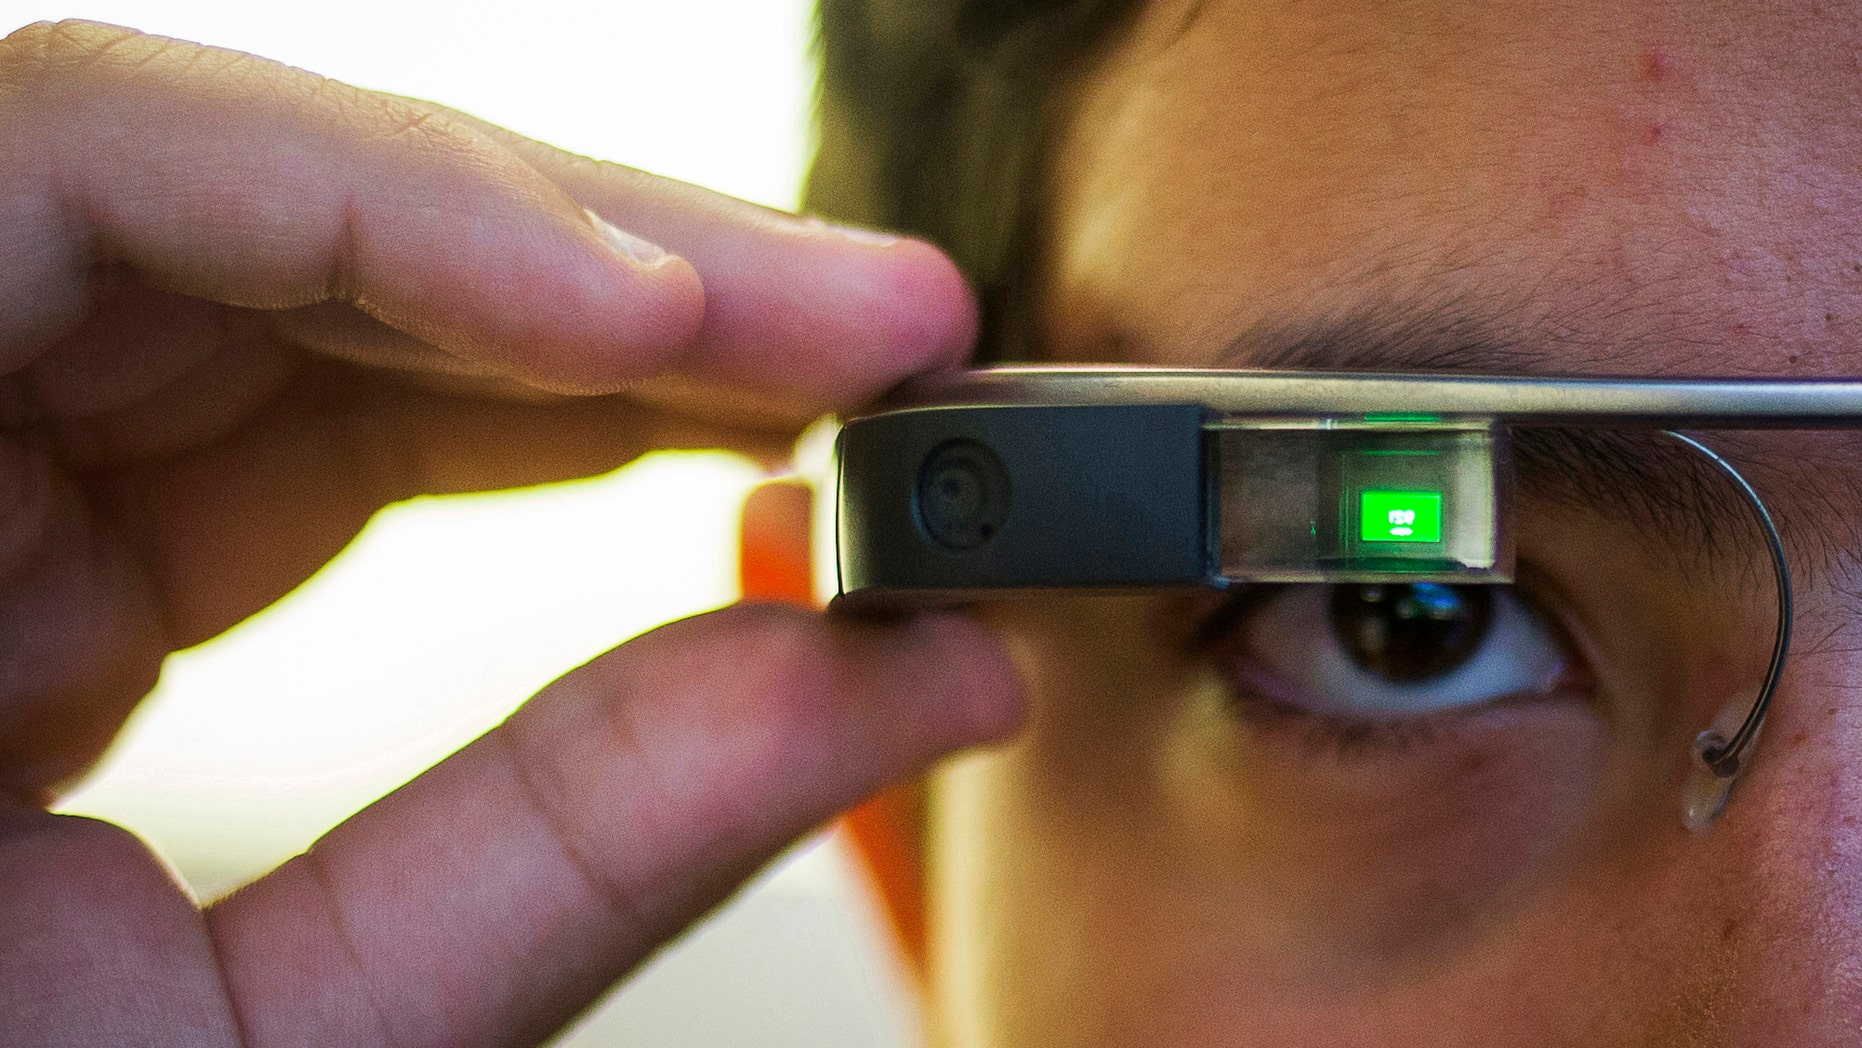 File photo - Tiago Amorim of Brazil, poses with a Google Glass eyewear frame in Manhattan, New York Sept. 19, 2014.